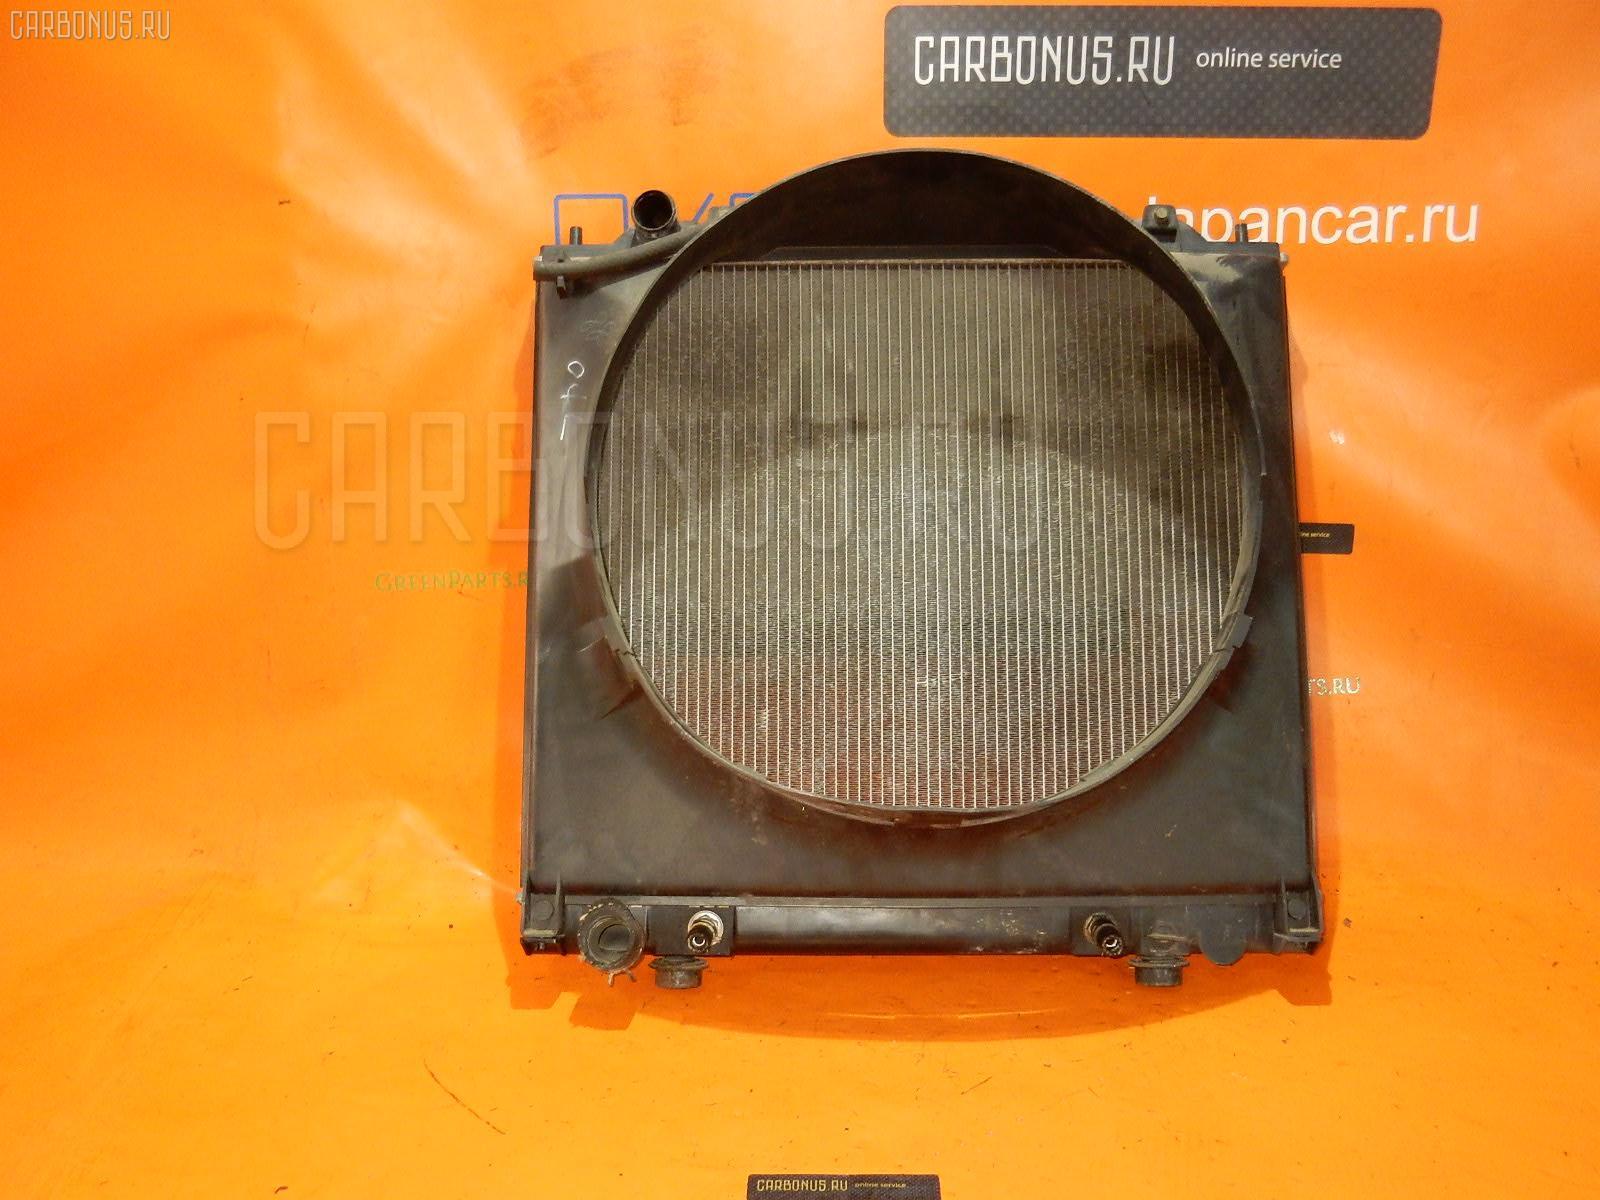 Радиатор ДВС Mitsubishi Delica space gear PD6W 6G72 Фото 1